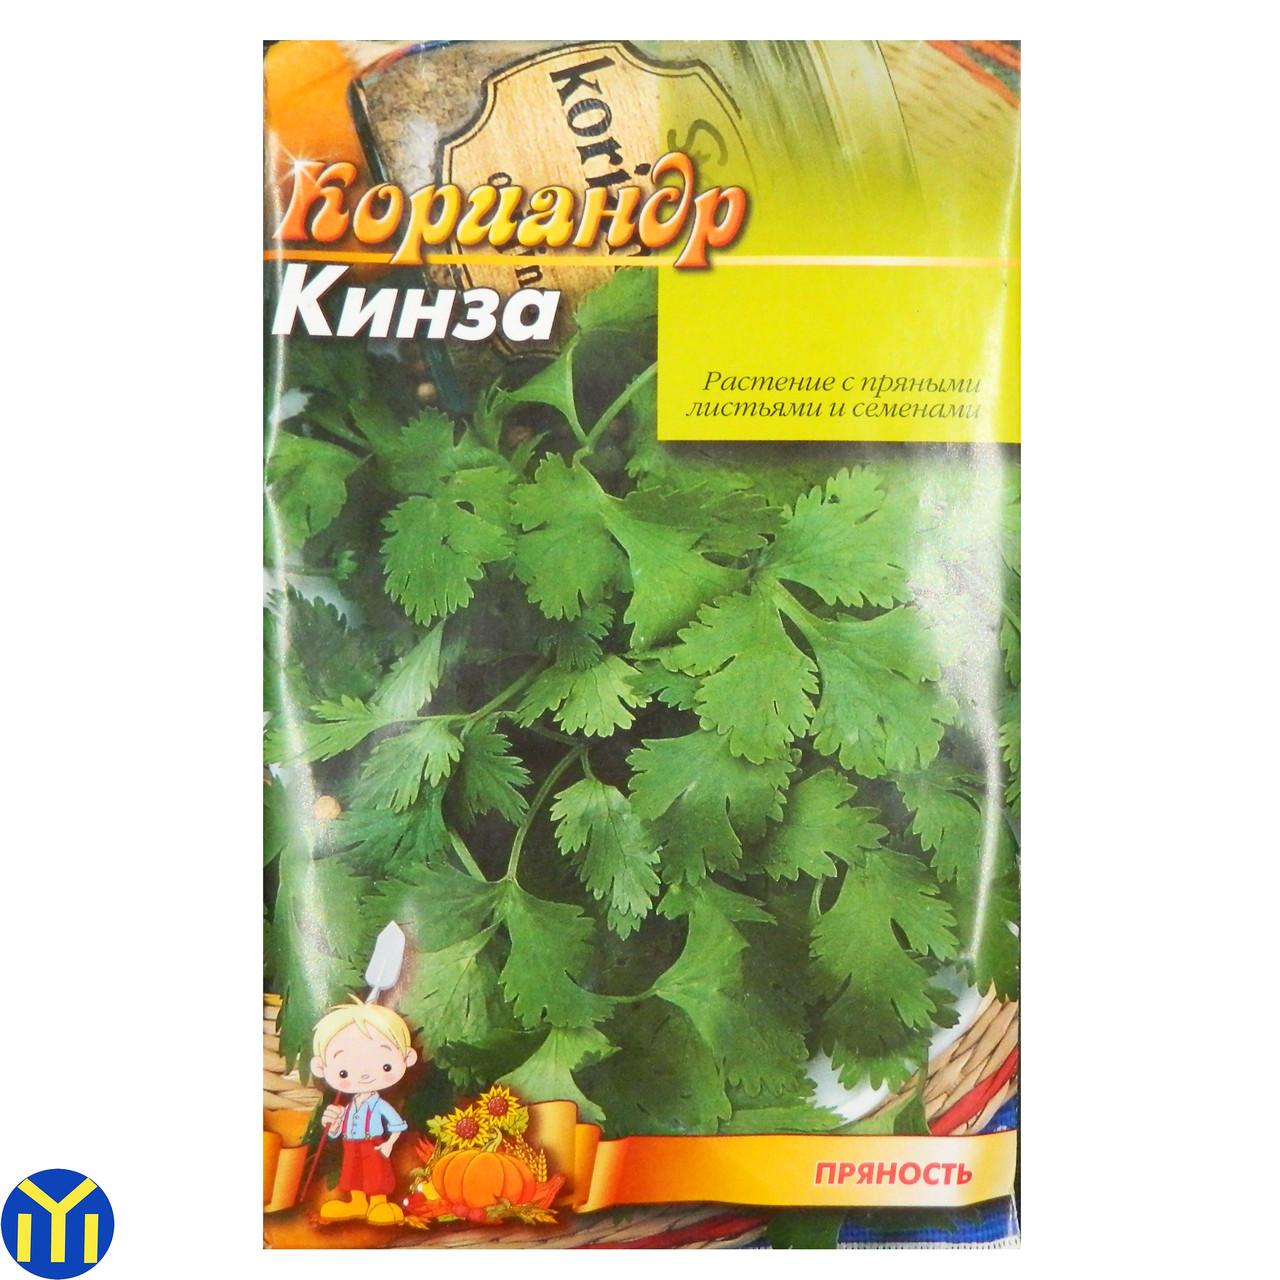 Семена кориандр Кинза, пряность